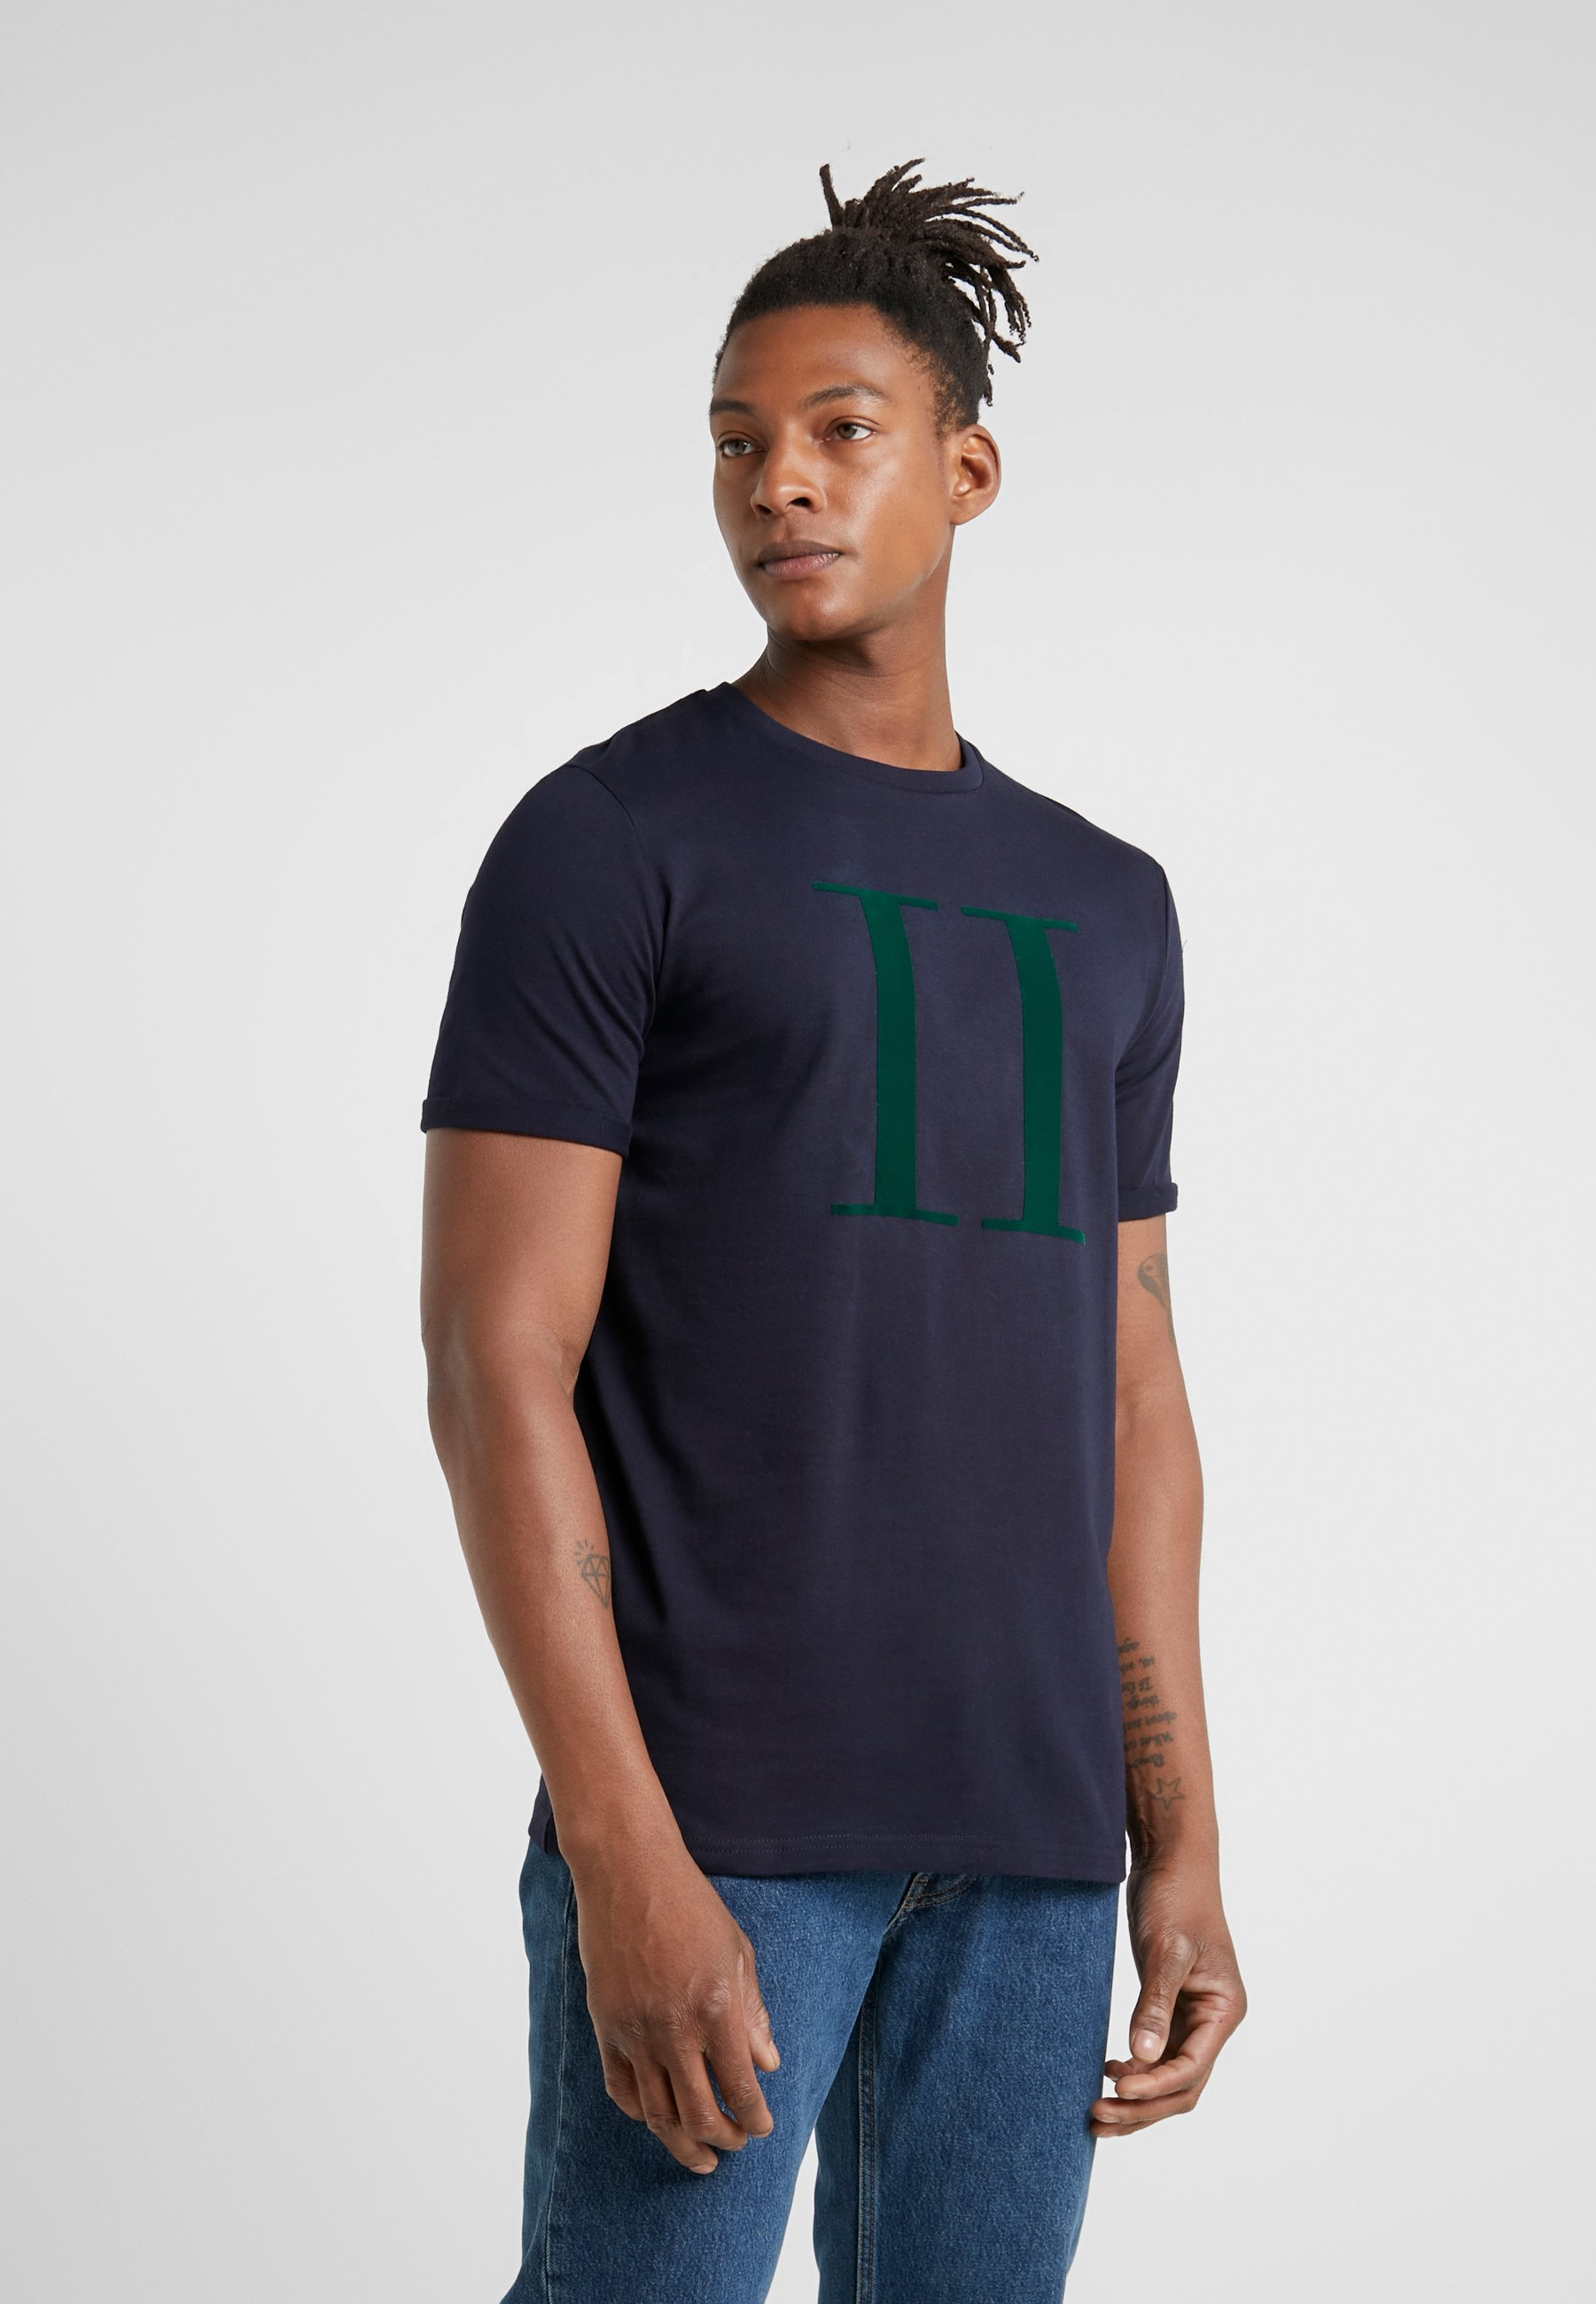 Les Deux Encore- T-shirt Print Dark Navy / Green CsXnAvOZ nbxx2CKX